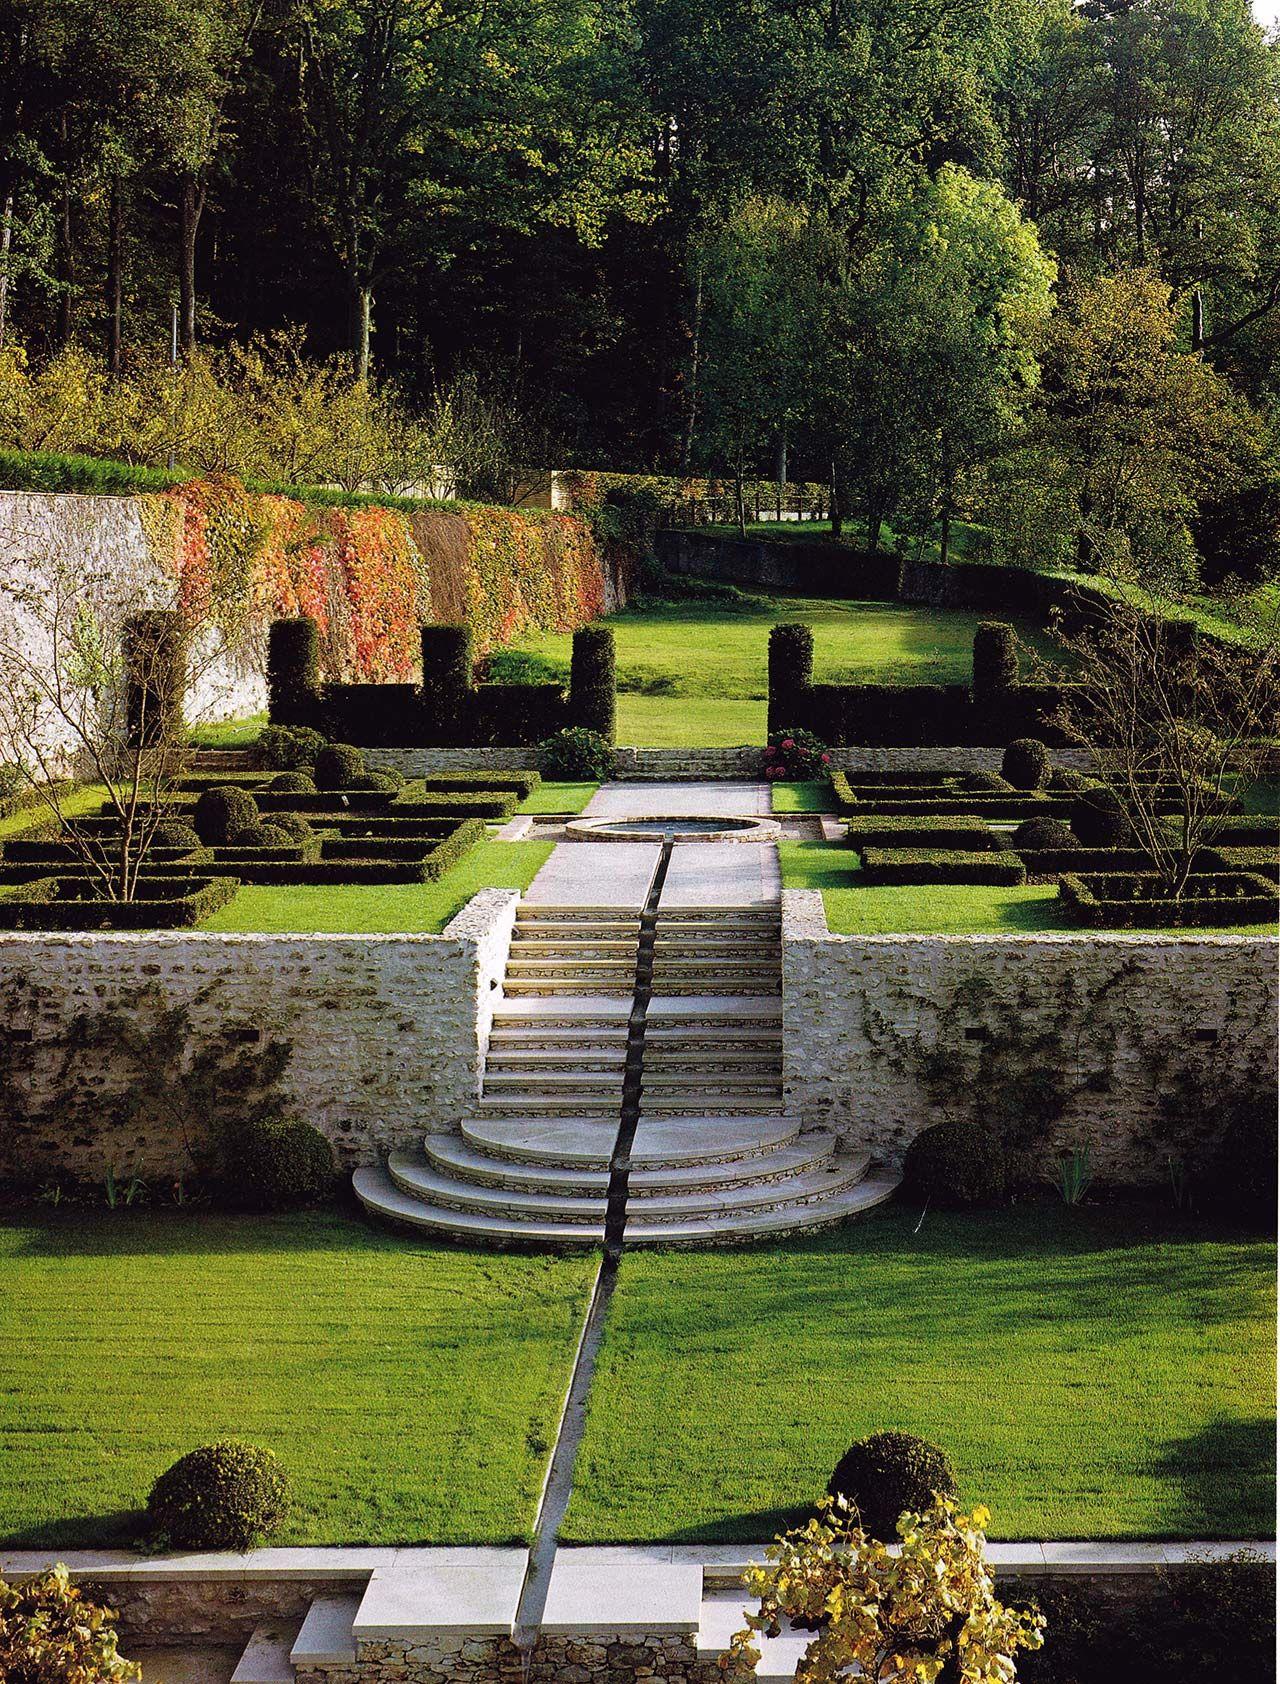 Classic Gardens And Landscape Guerlain jean jacques hervy garden inspiration pinterest guerlain jean jacques hervy workwithnaturefo